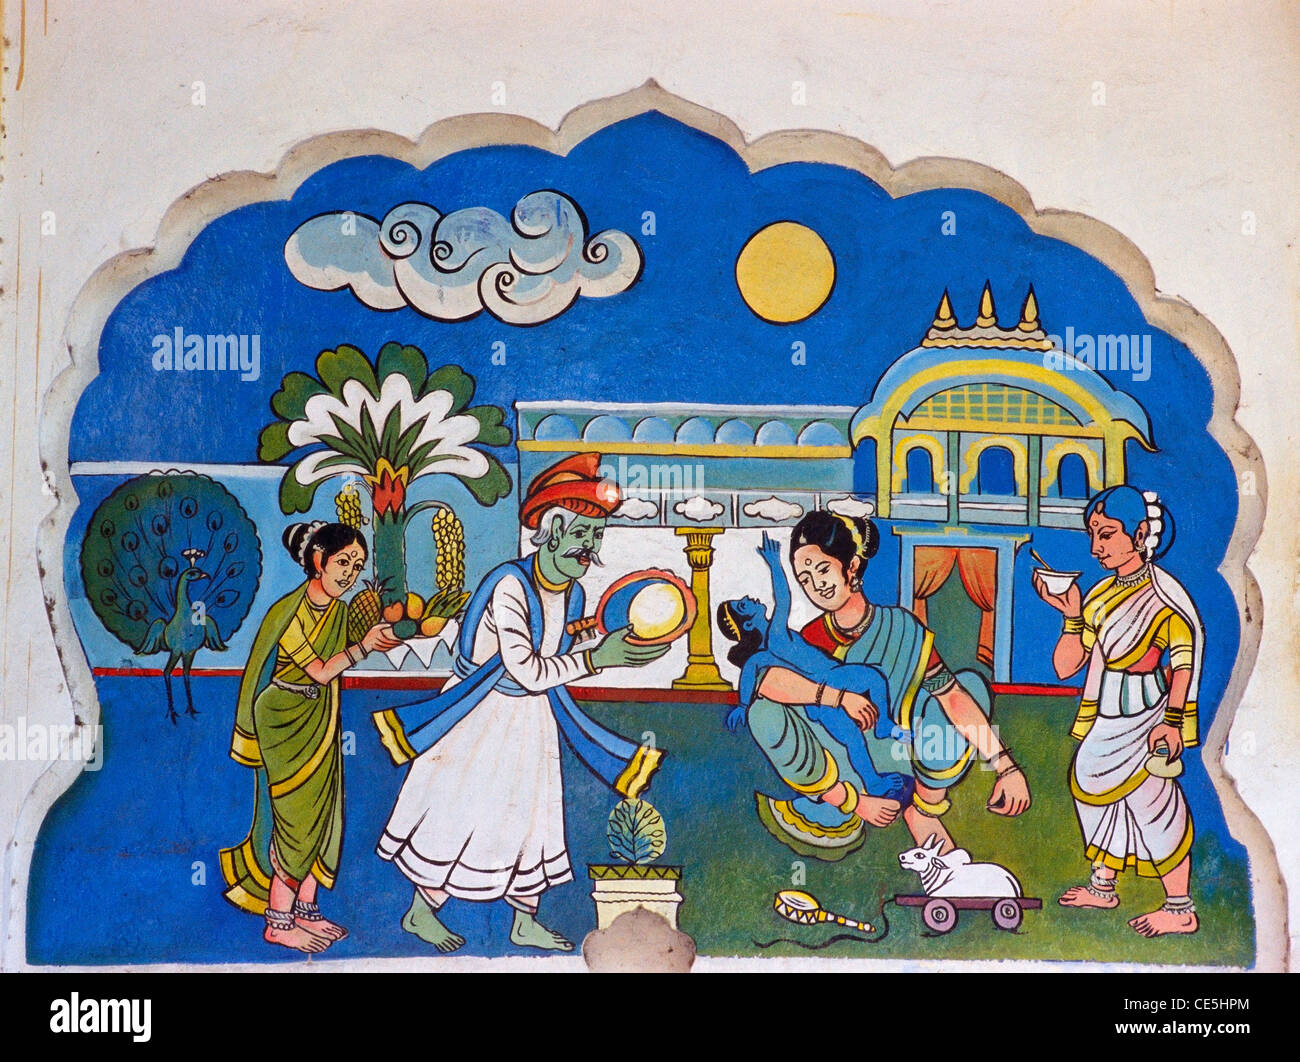 Wall painting of lord Rama wanting moon Ramayana story in